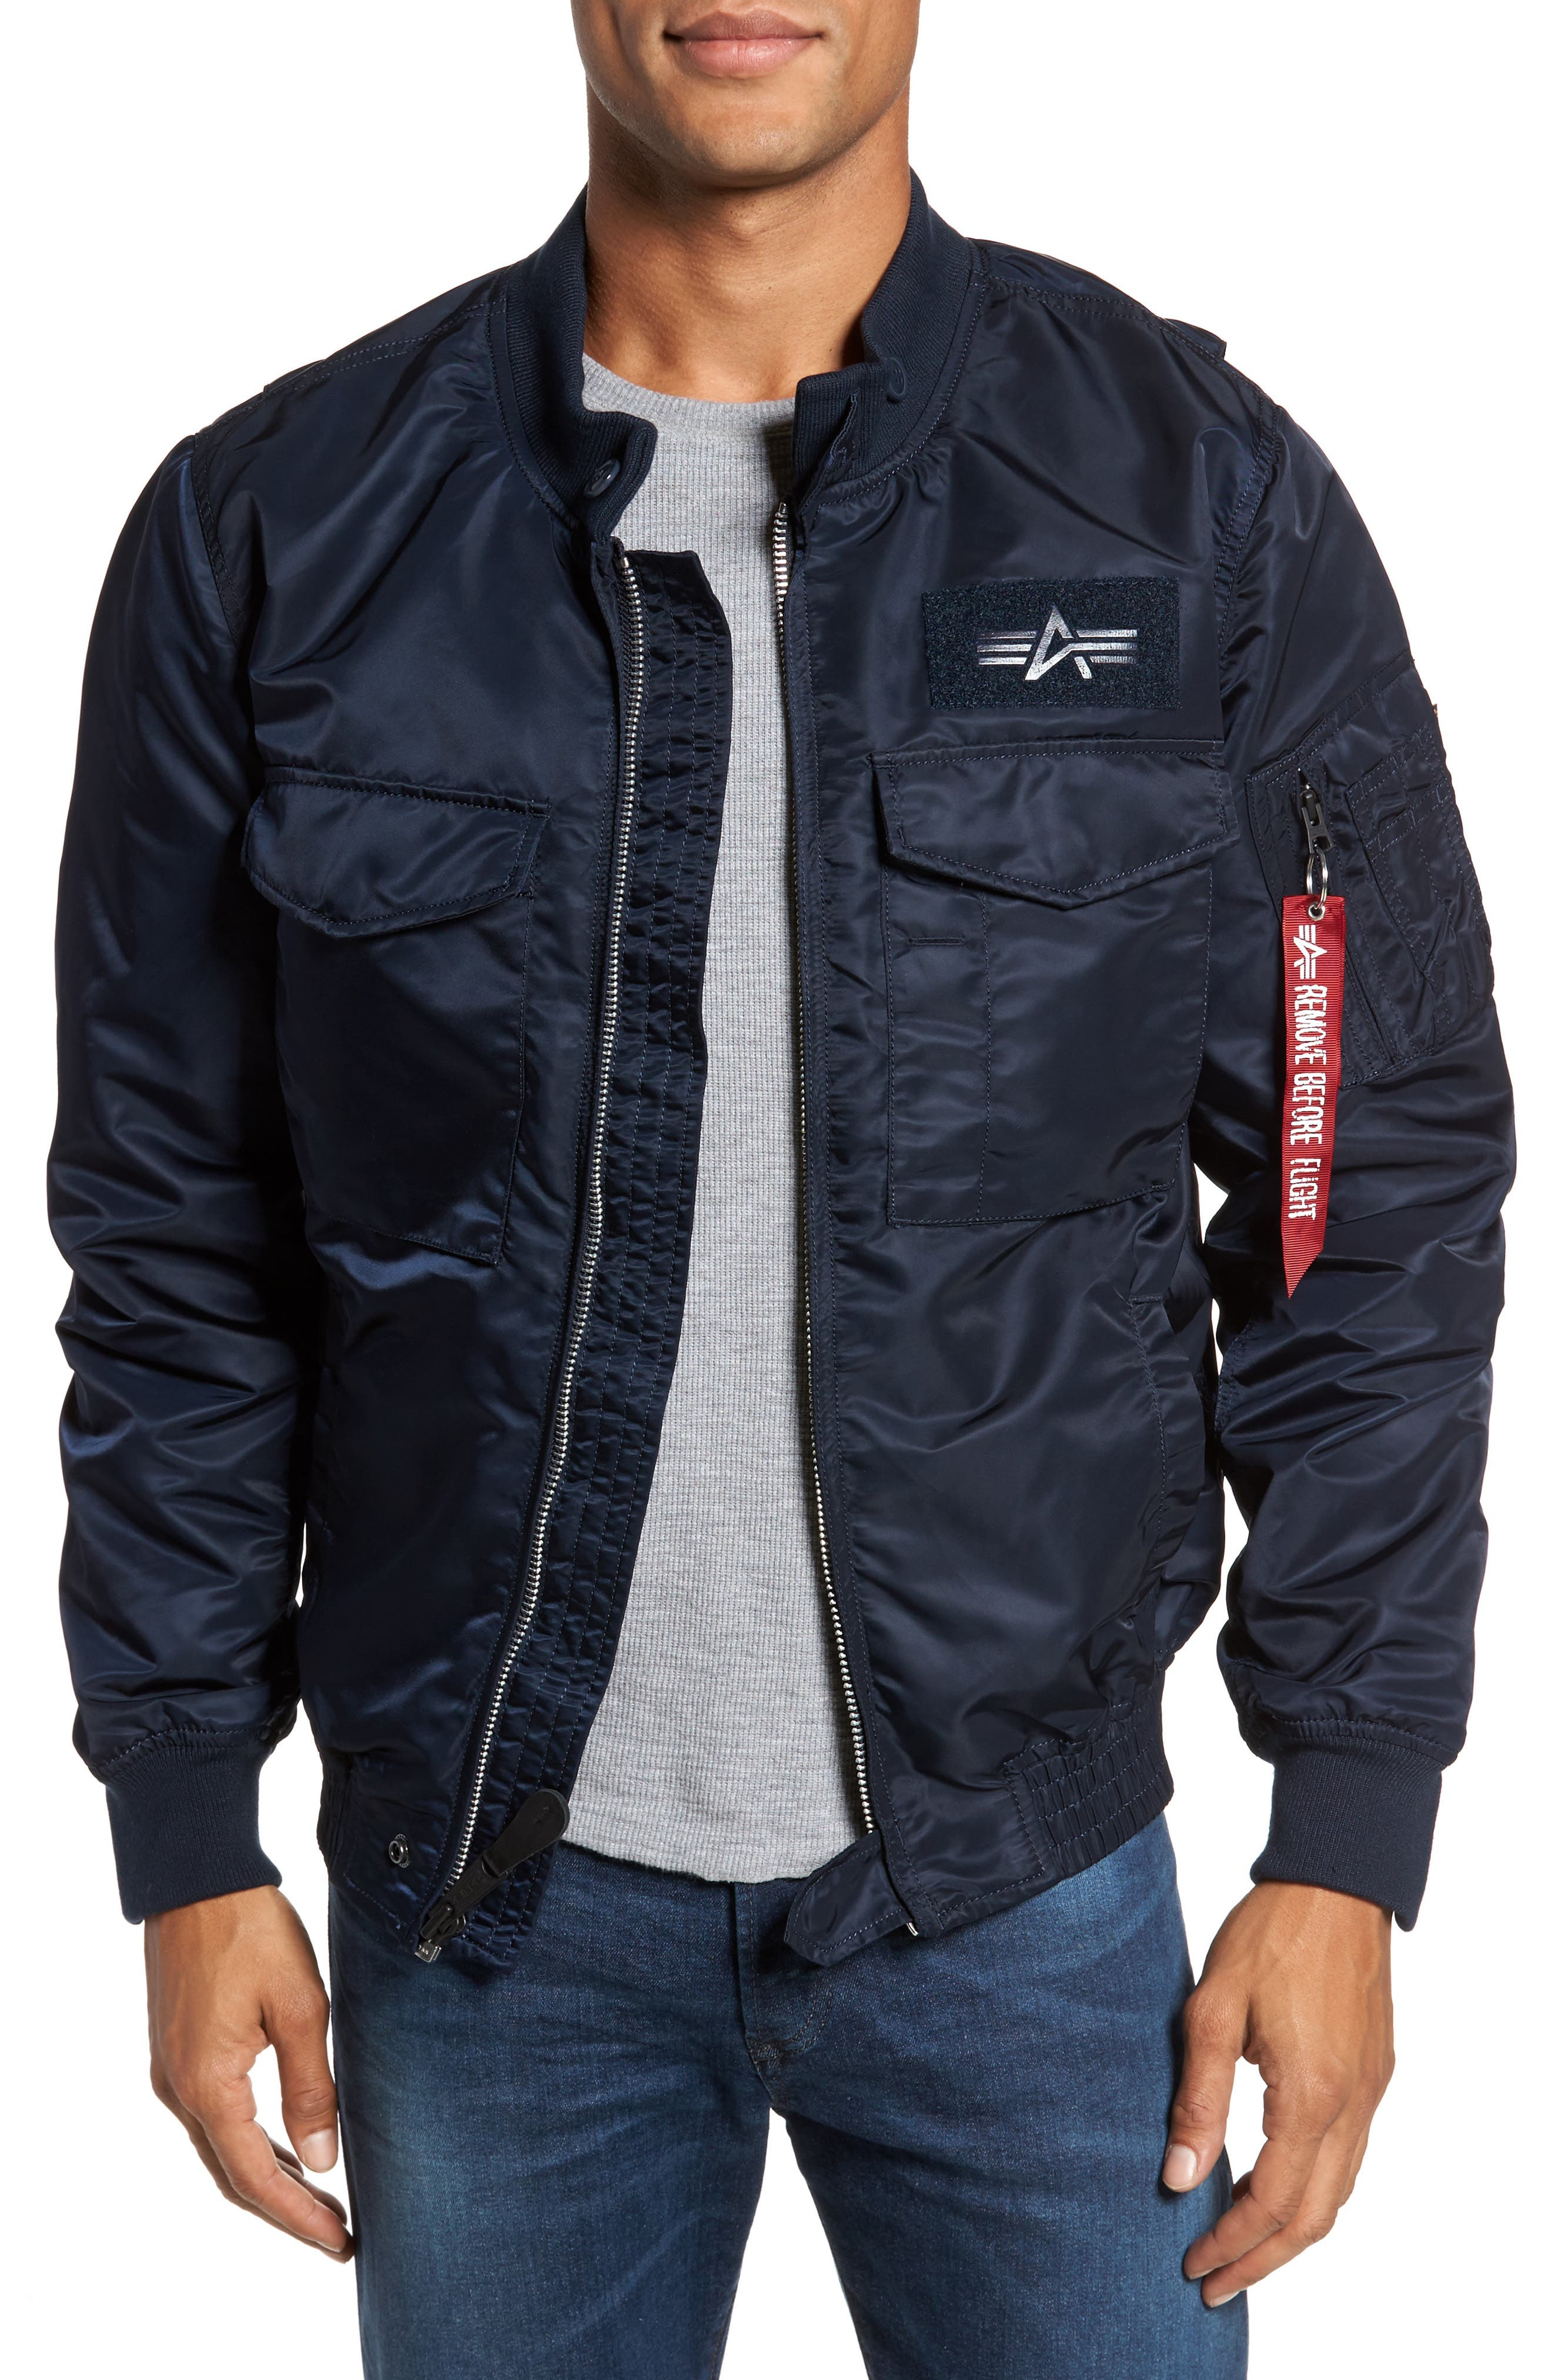 Alpha Industries Weps Mod Jacket